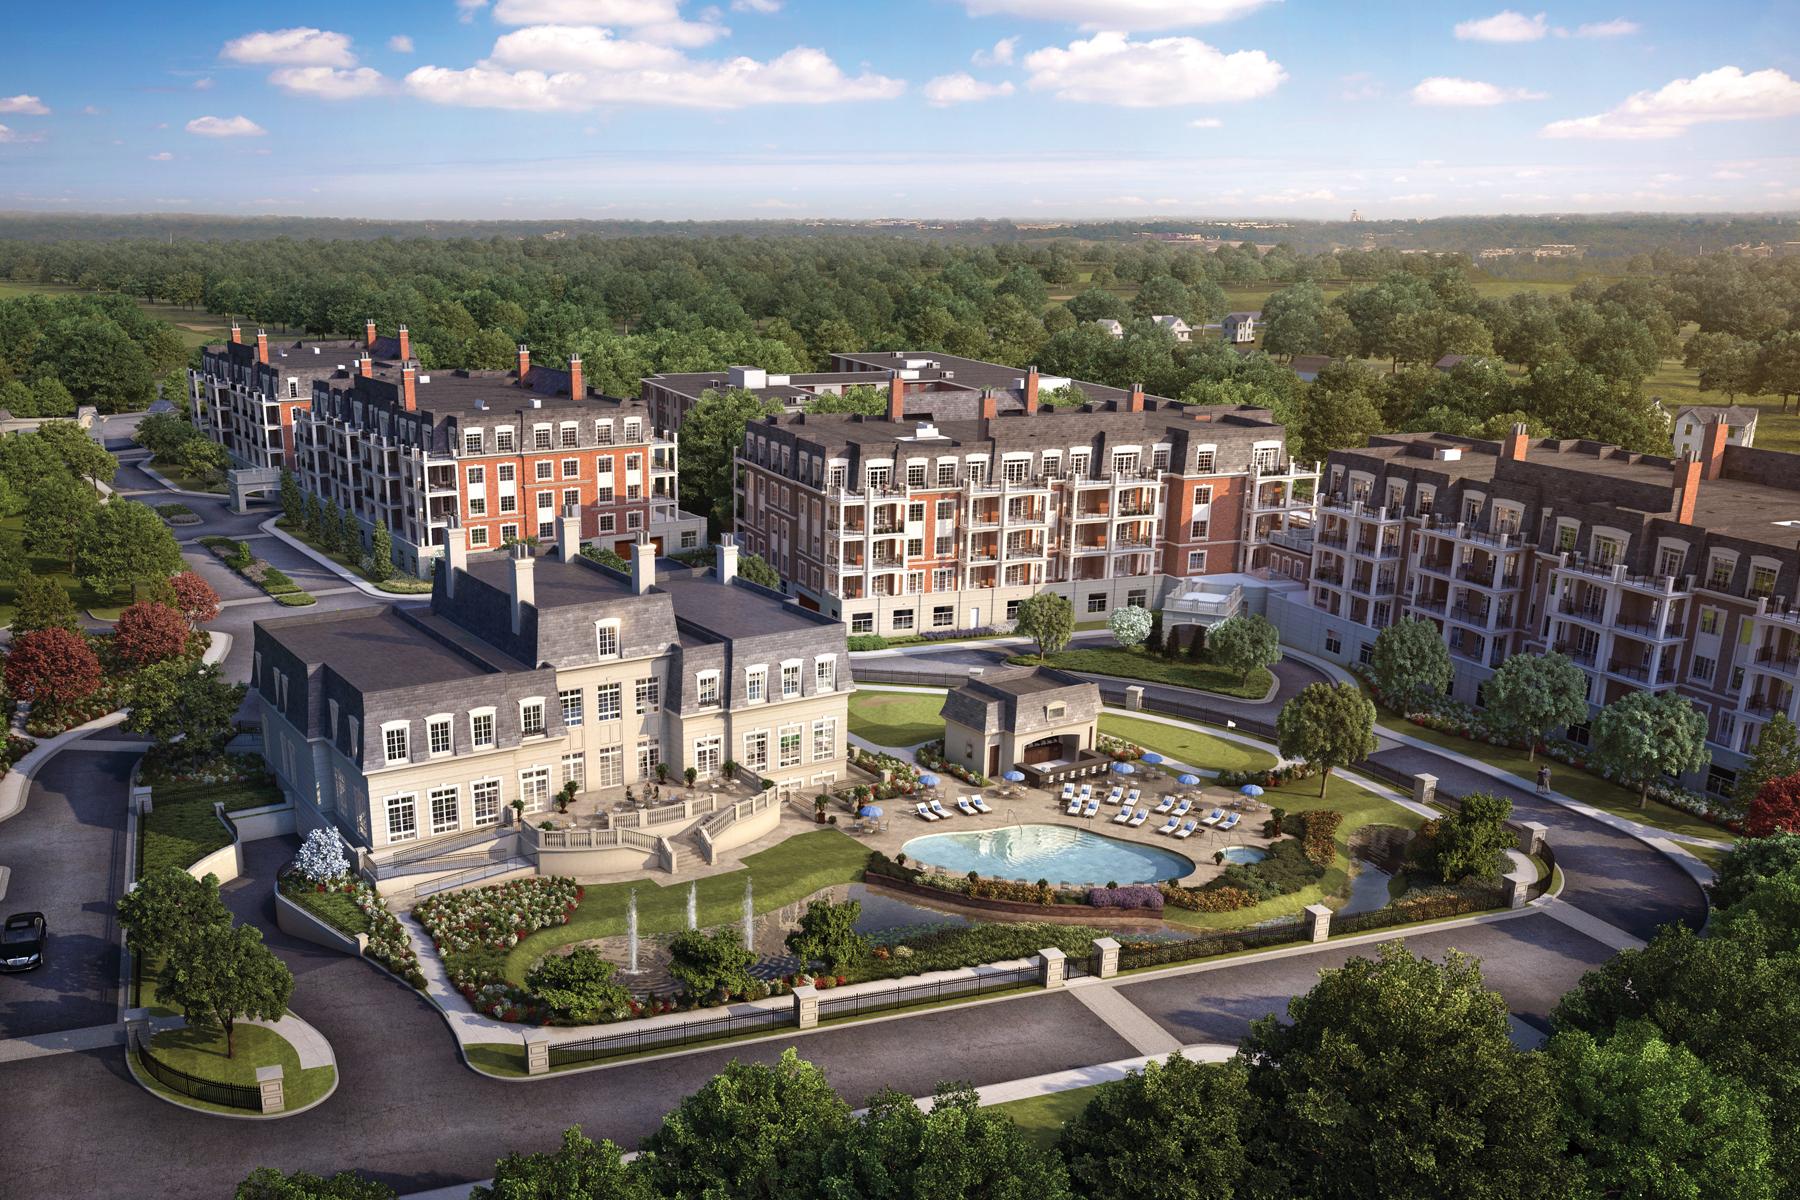 Condominium for Sale at 3000 Royal Court, 3205, North Hills, NY 11040 3000 Royal Ct 3205, North Hills, New York, 11040 United States